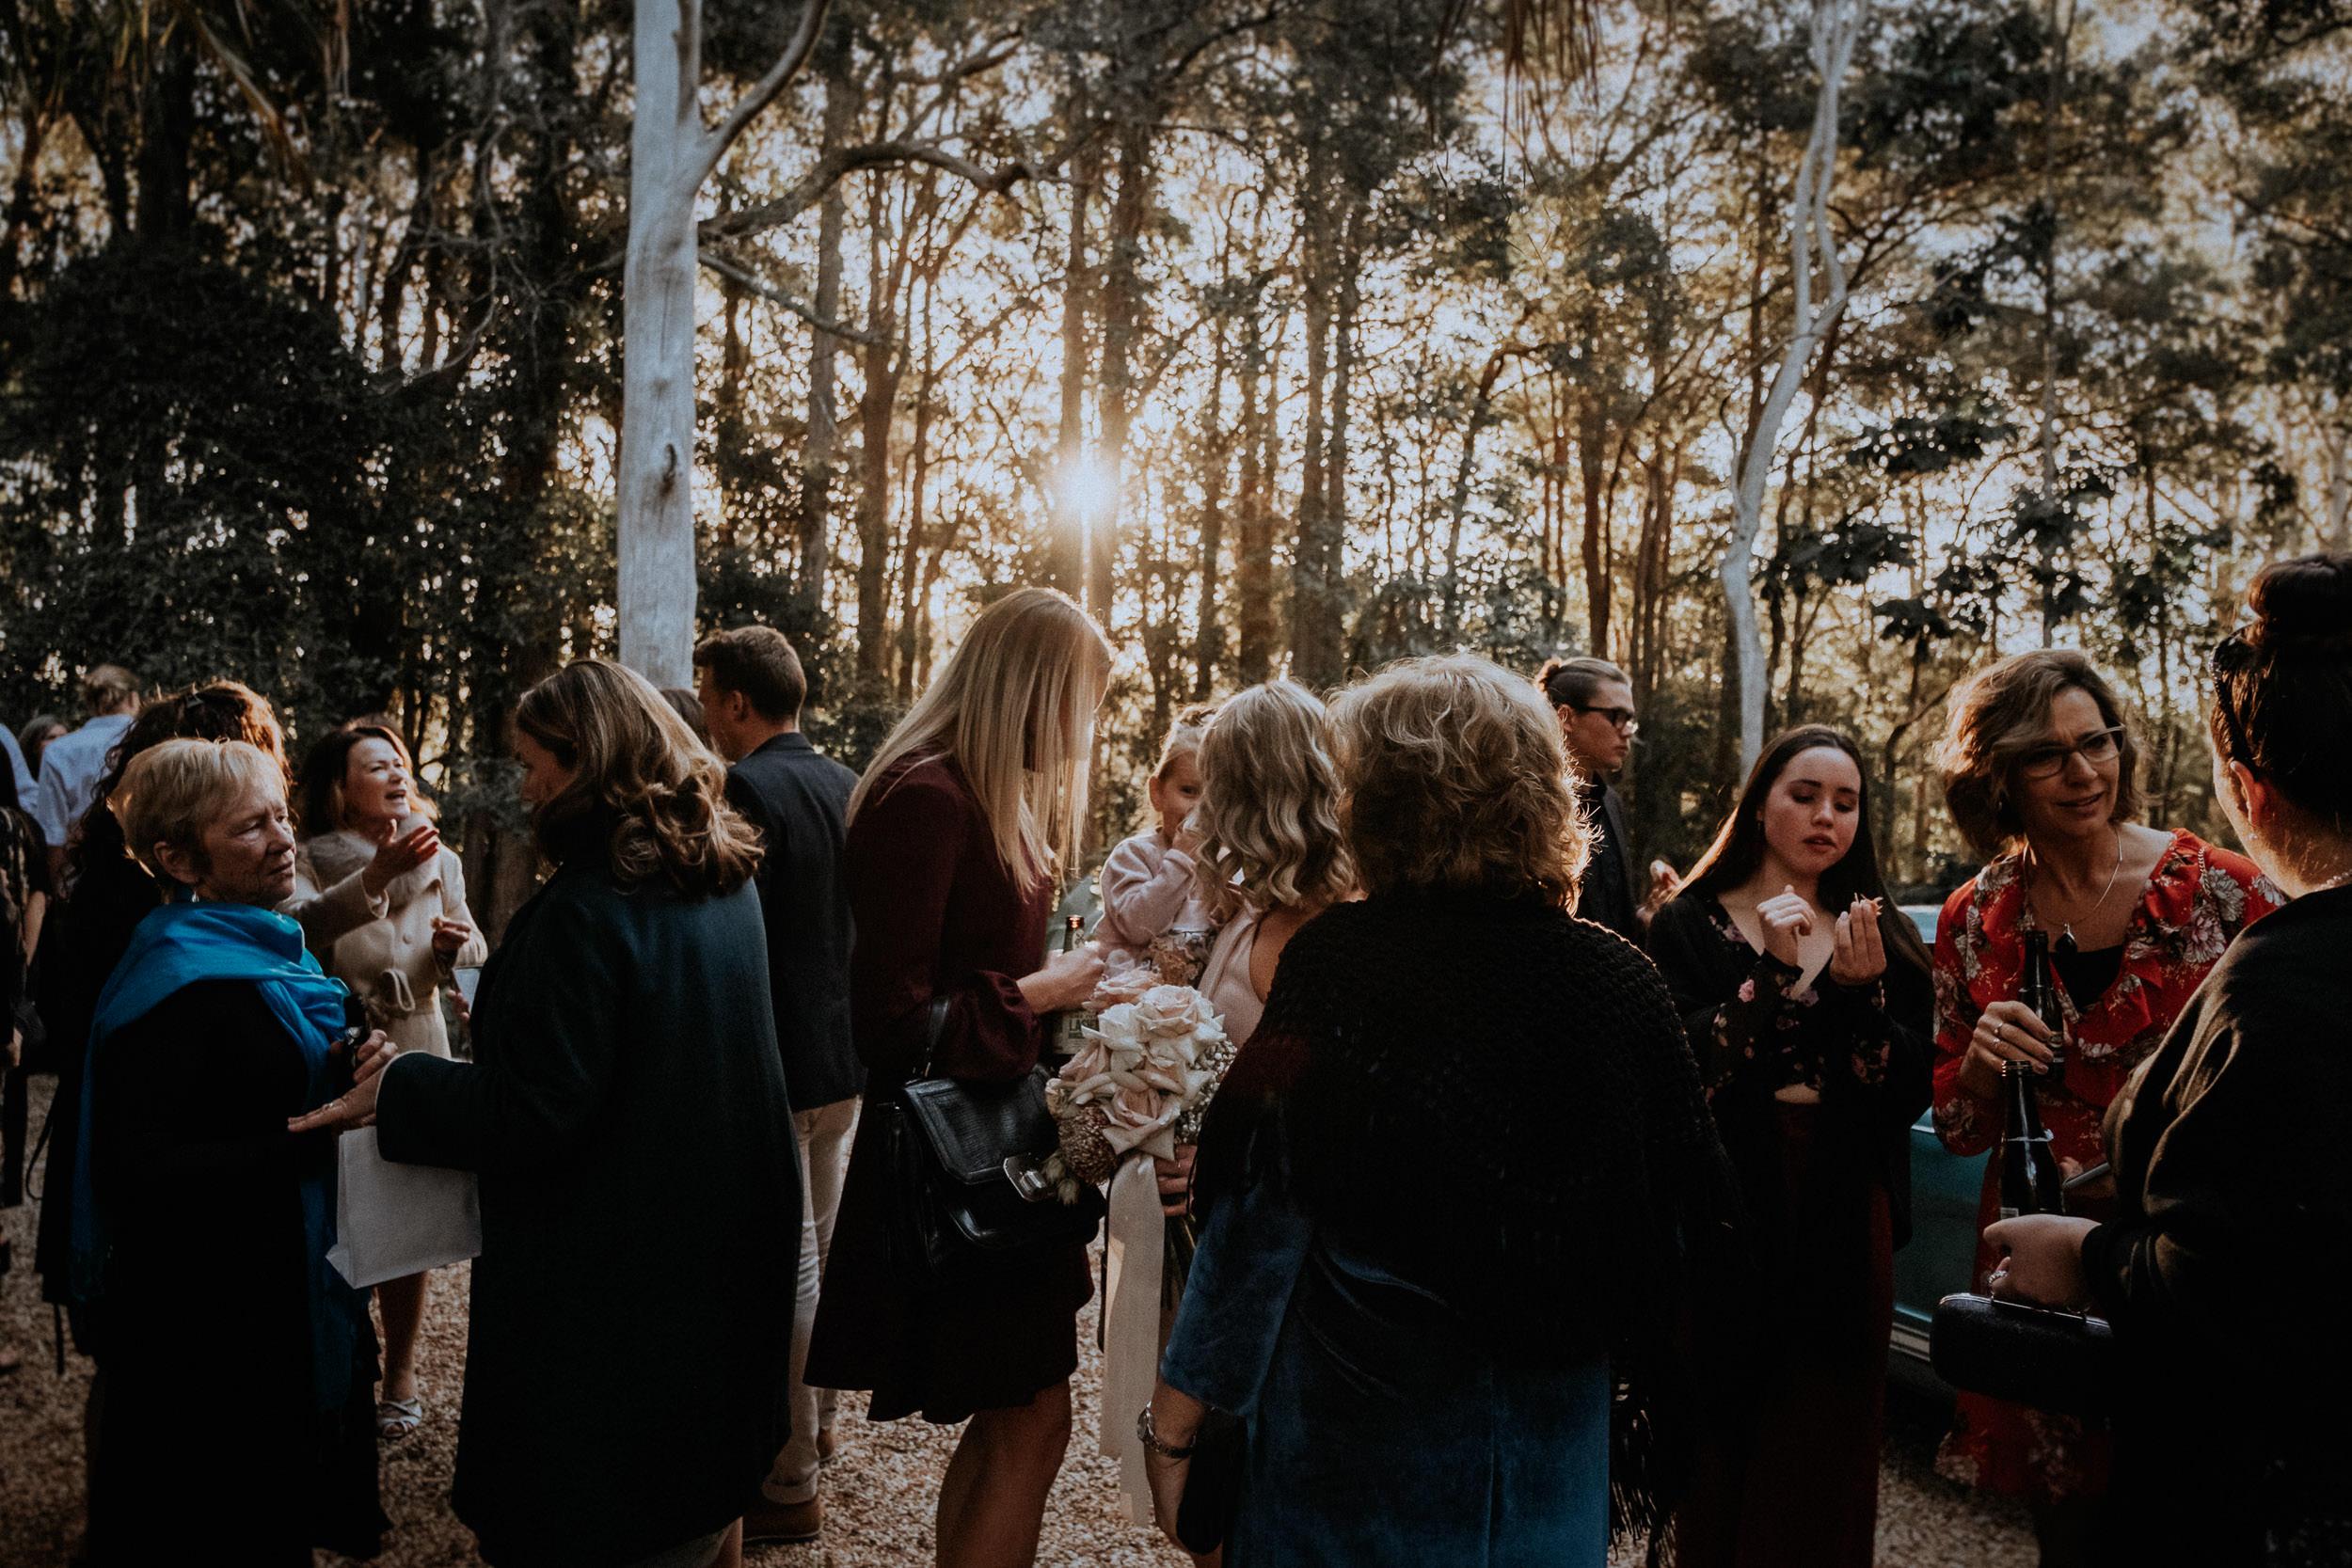 S&A Elopement - Kings & Thieves - Shred 'Til Dead - Central Coast Beach Forest Wedding - 332.jpg